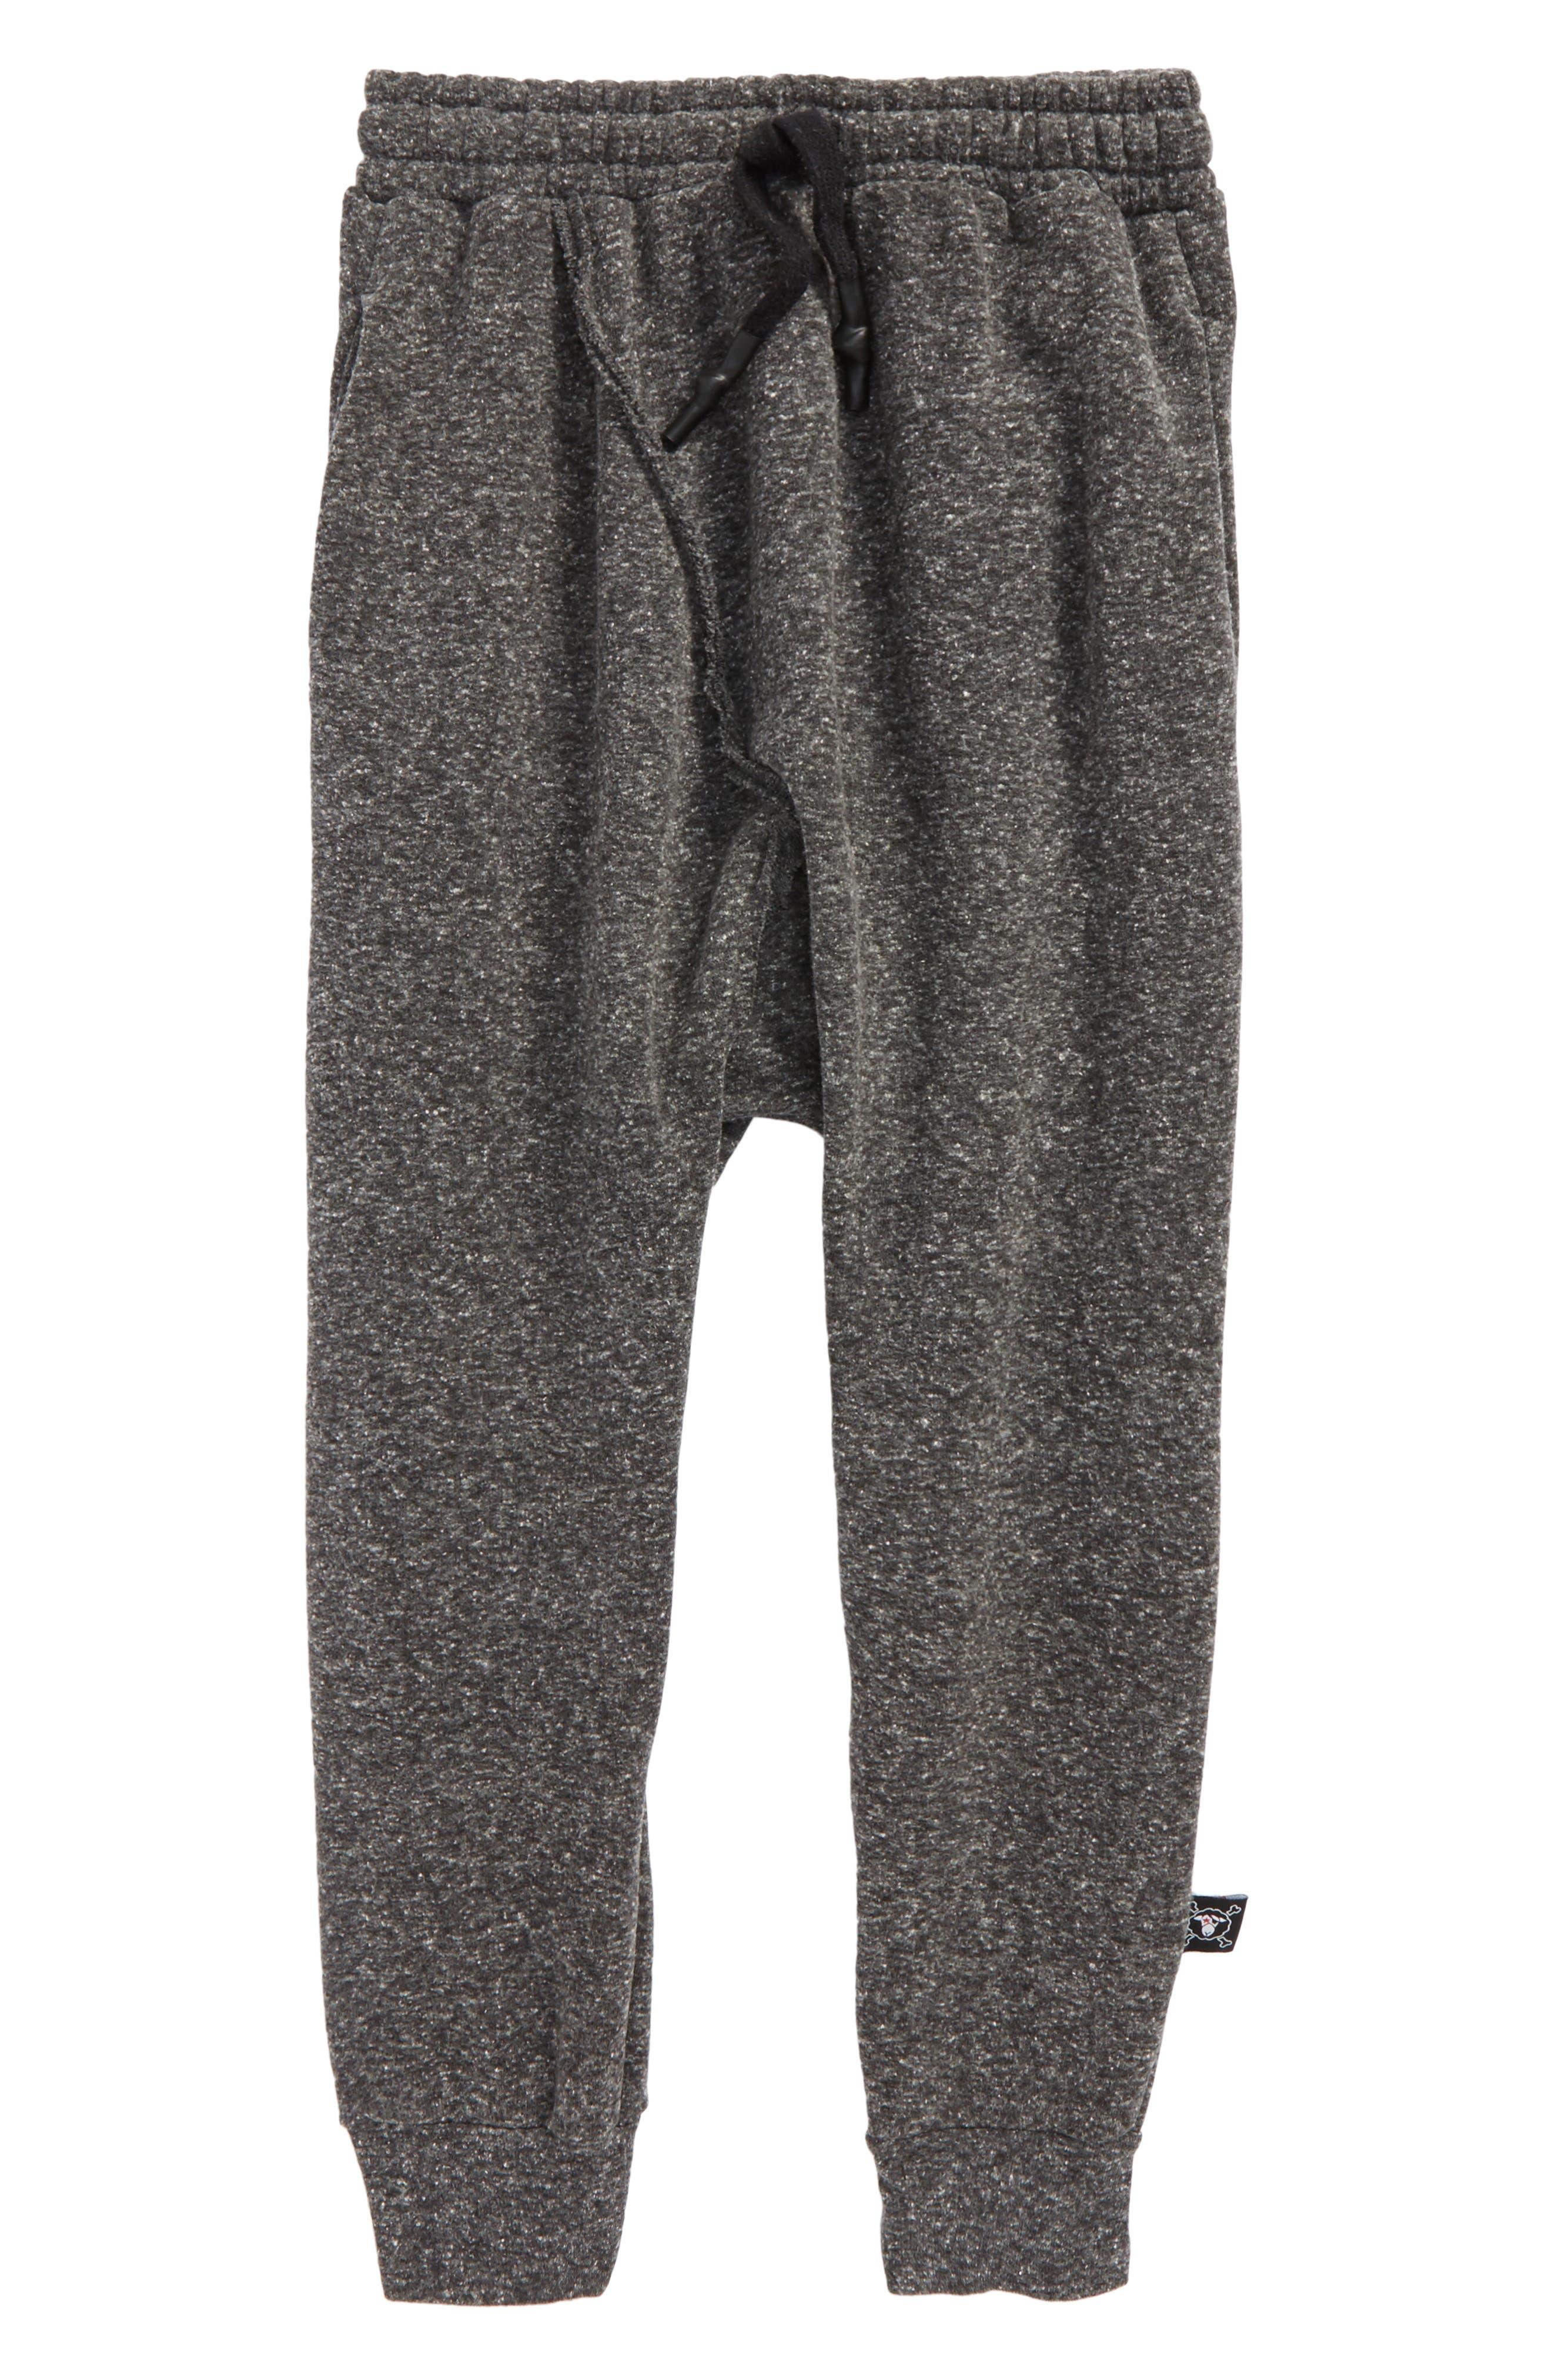 Raw Baggy Pants,                         Main,                         color, Charcoal